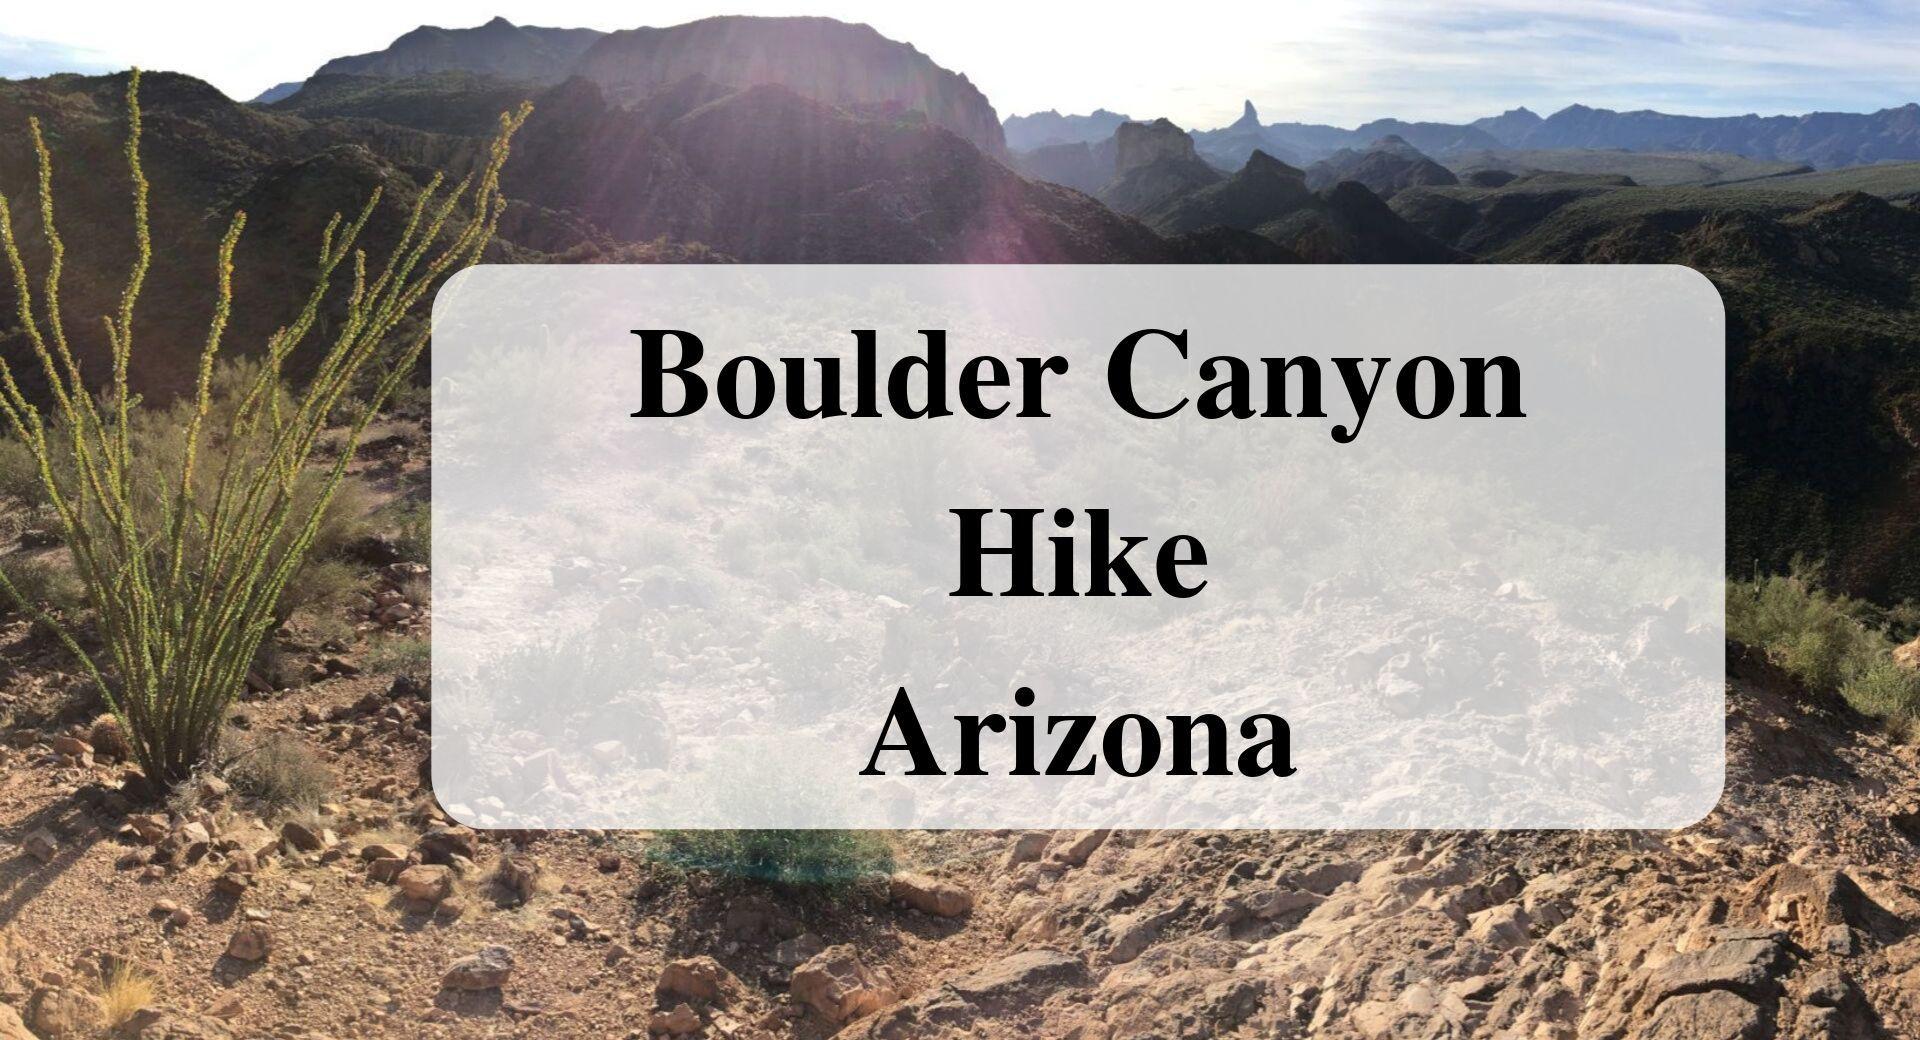 Boulder Canyon Hike Arizona main